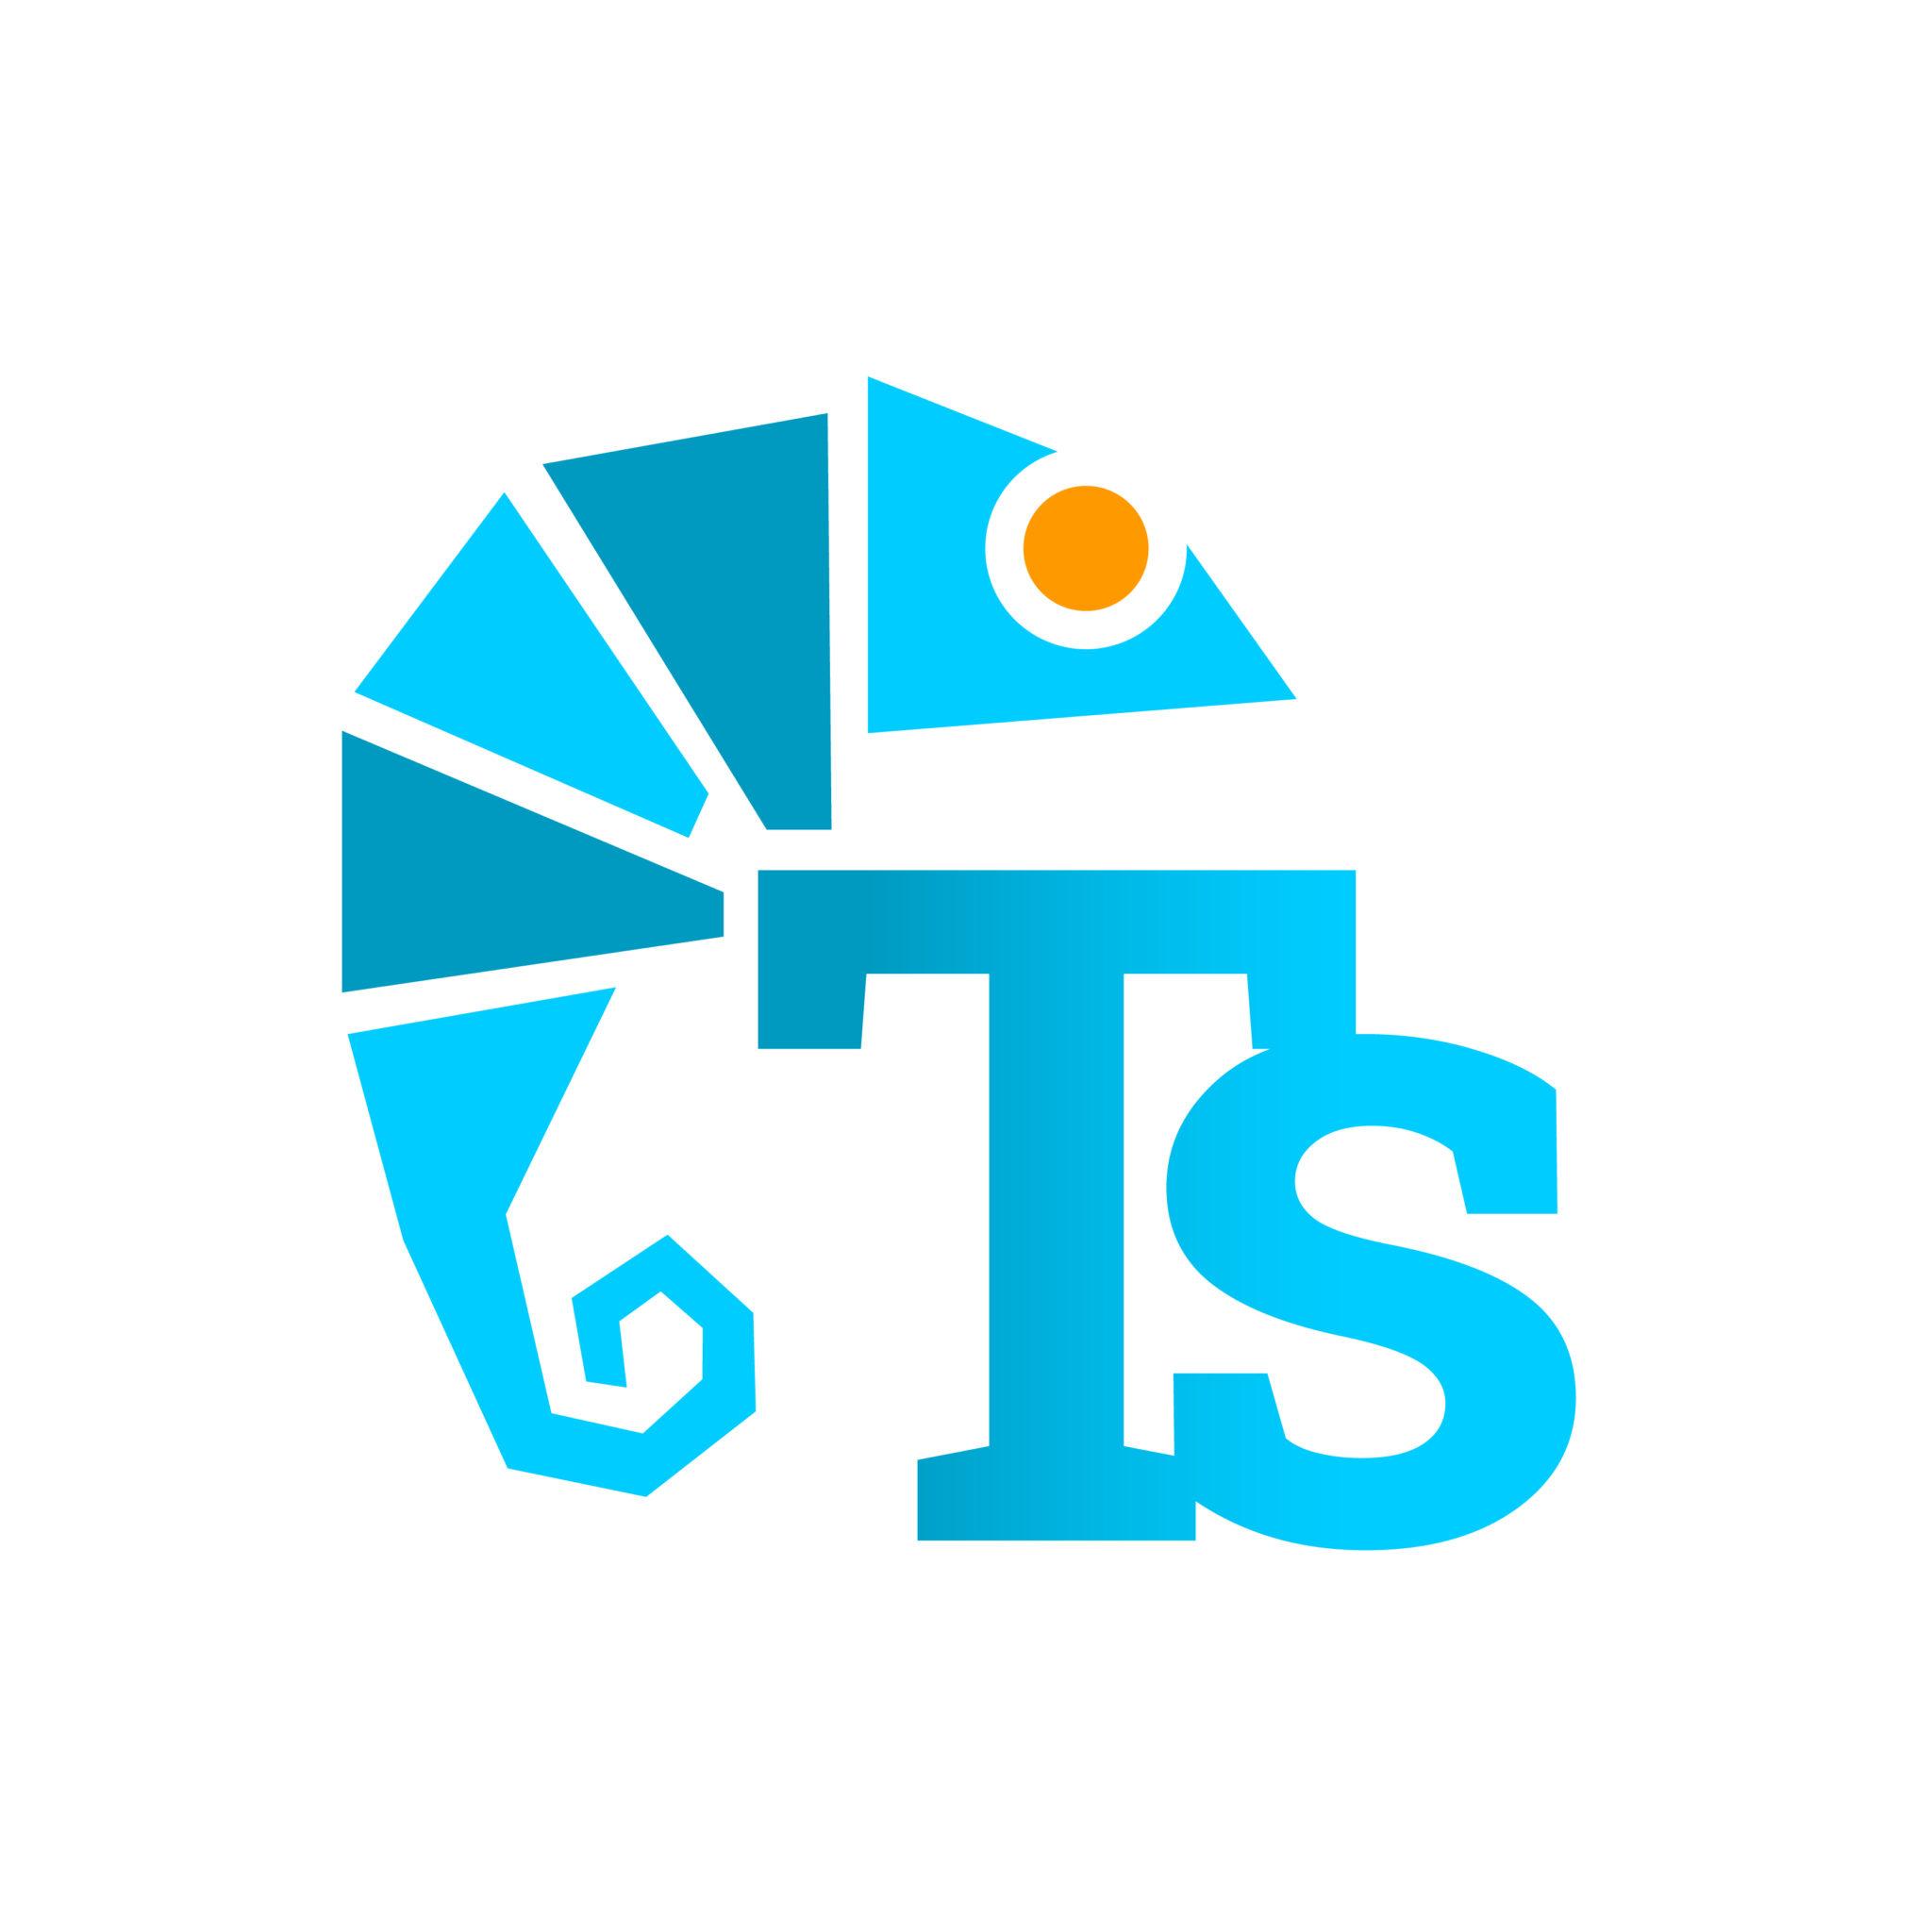 logo-tweakstyle1-arnaudneubert